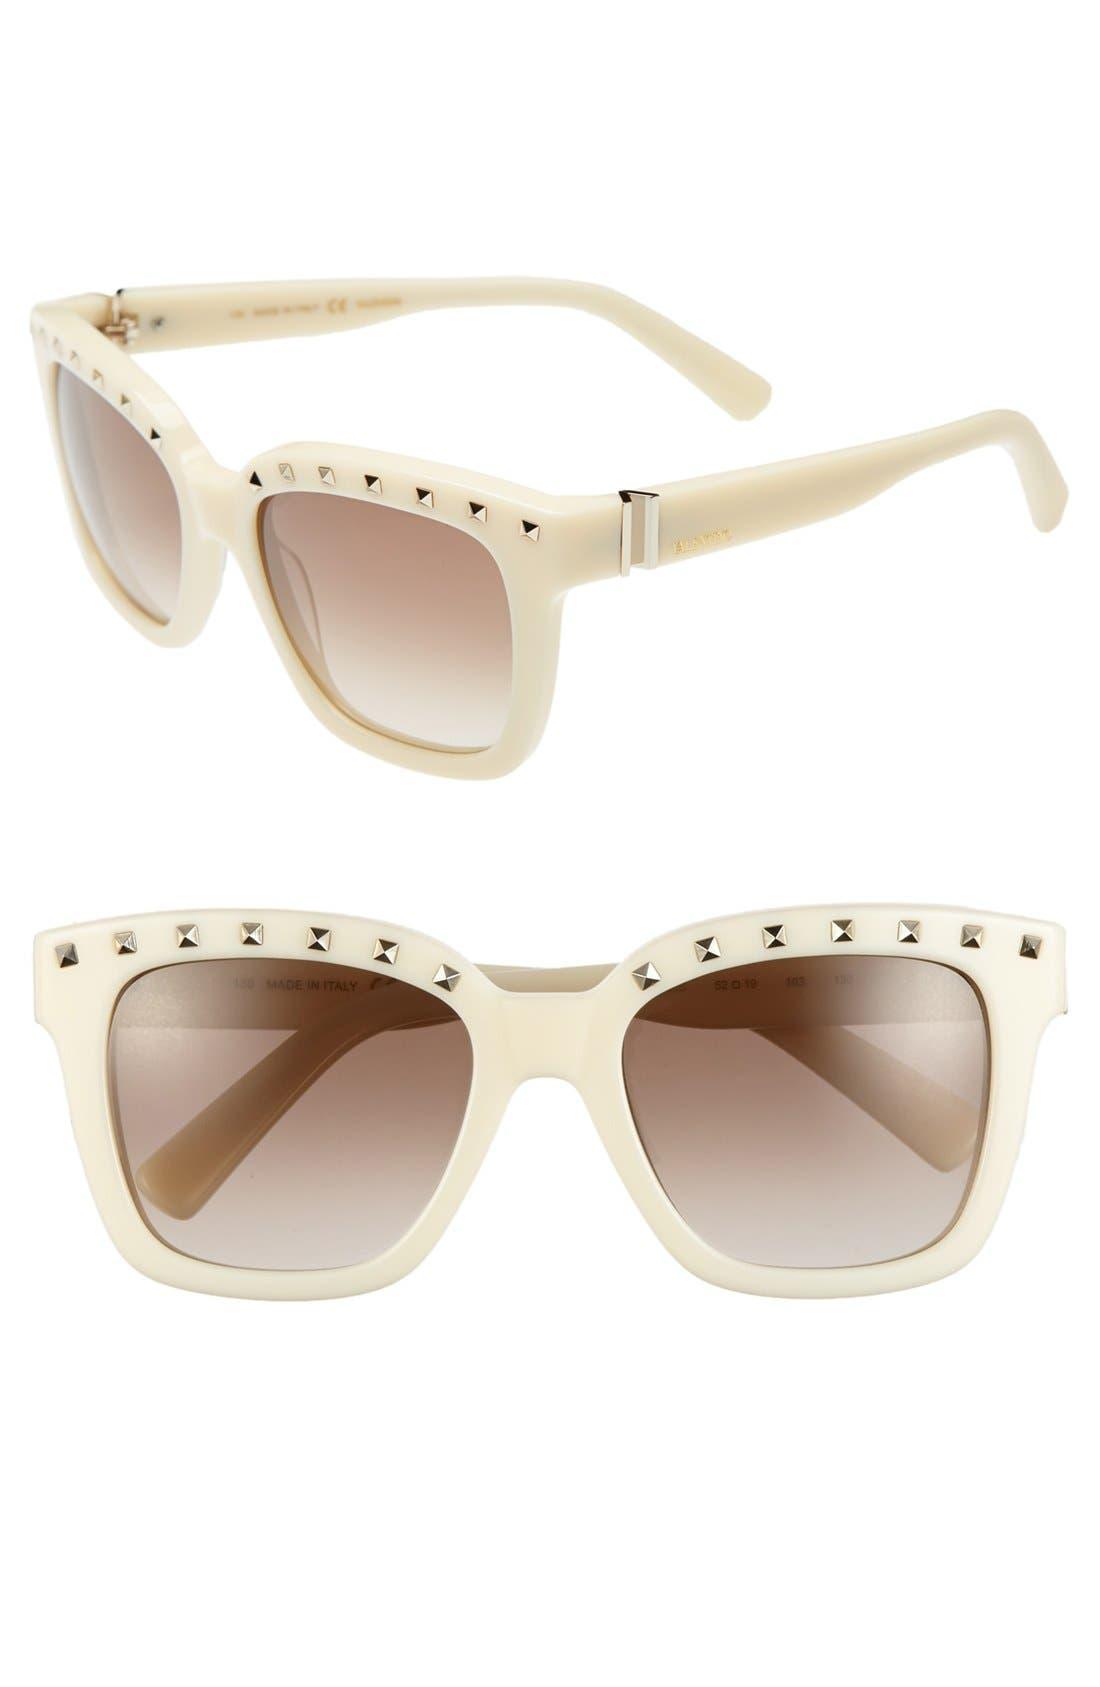 Main Image - Valentino 'Rockstud' 52mm Sunglasses